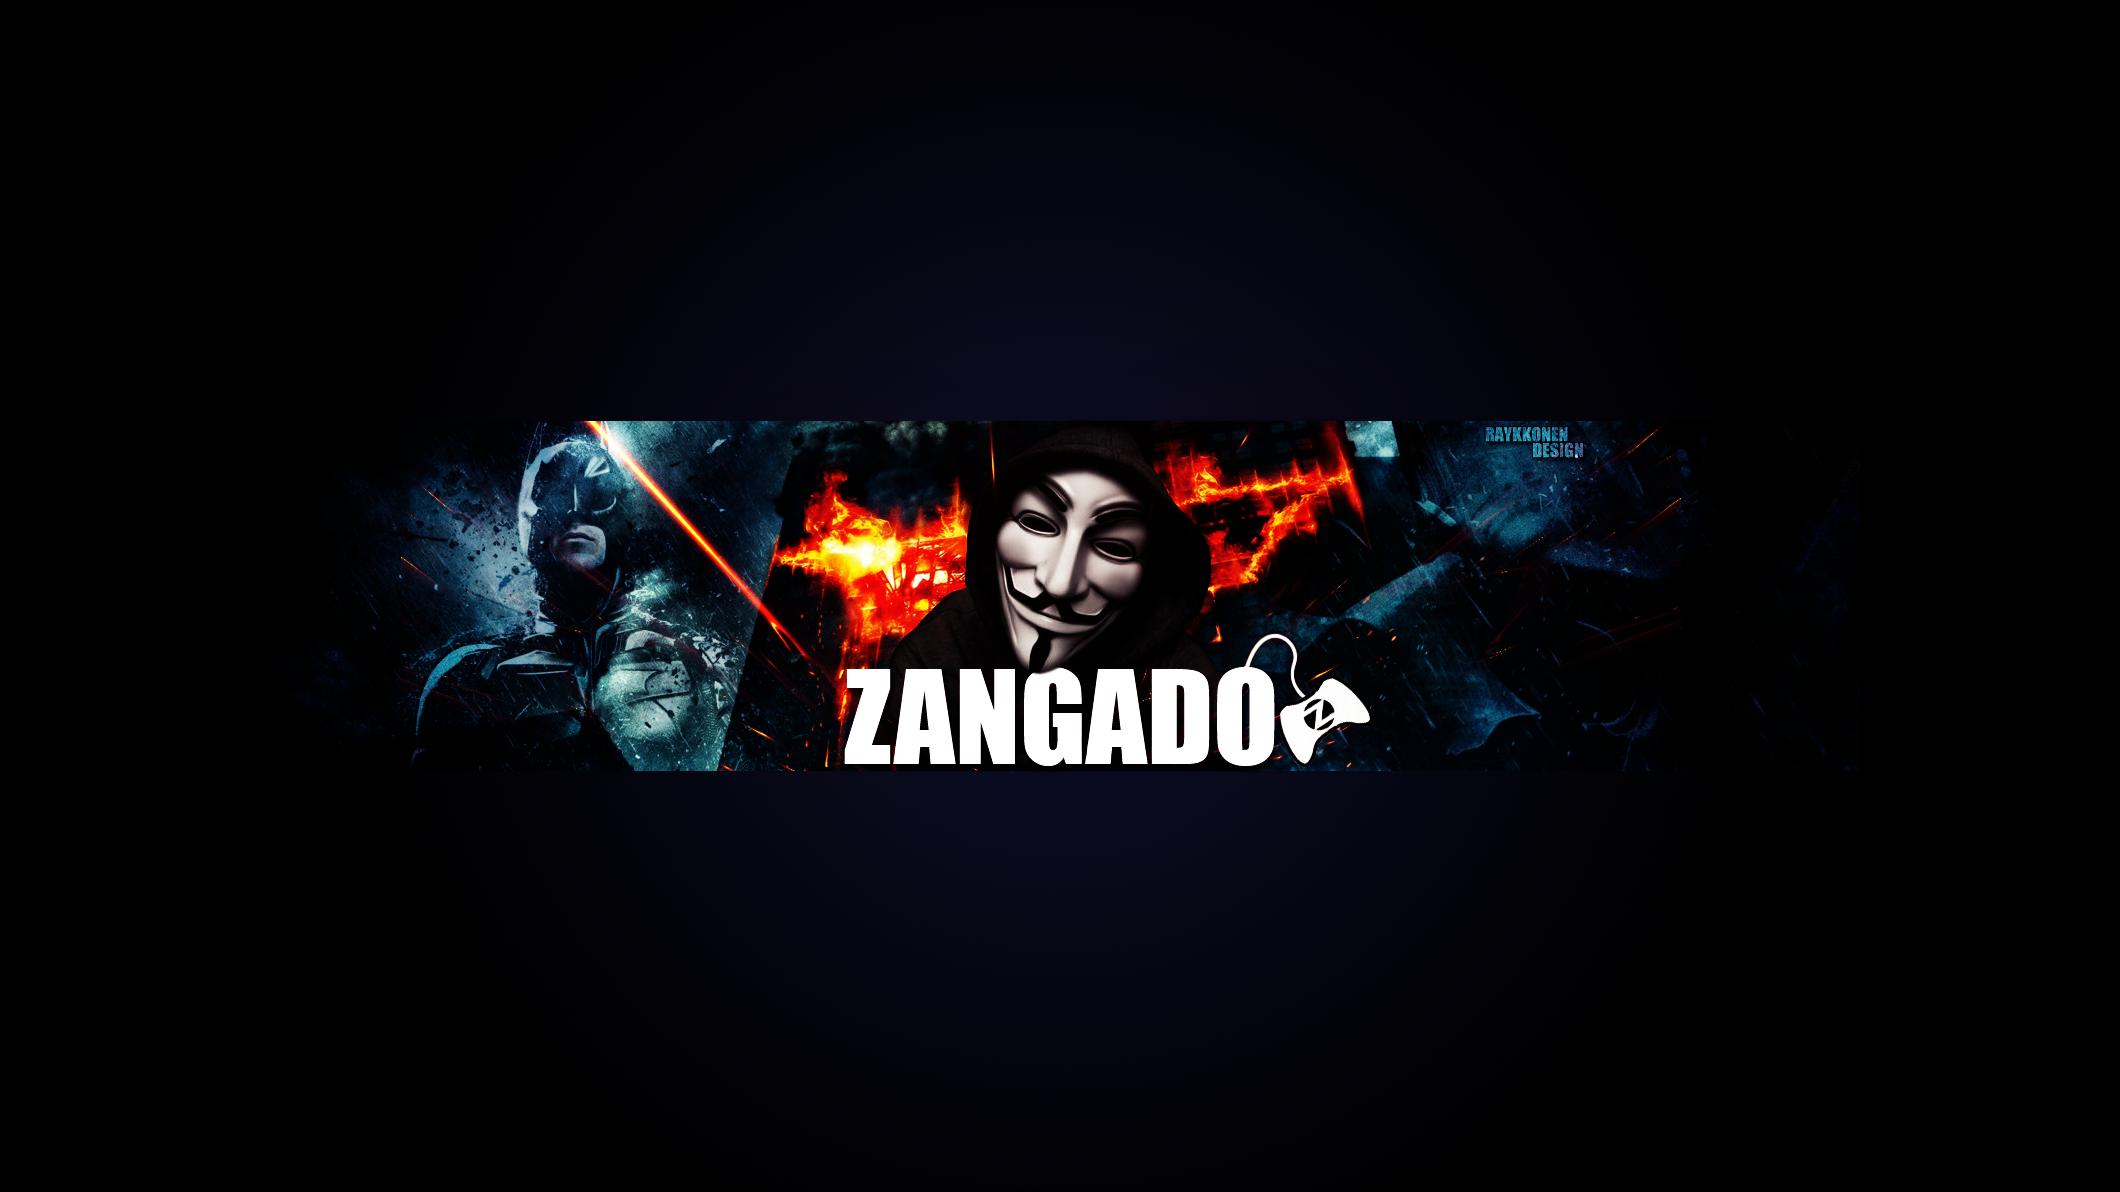 Banner Zangado Games By Raykkonen On Deviantart